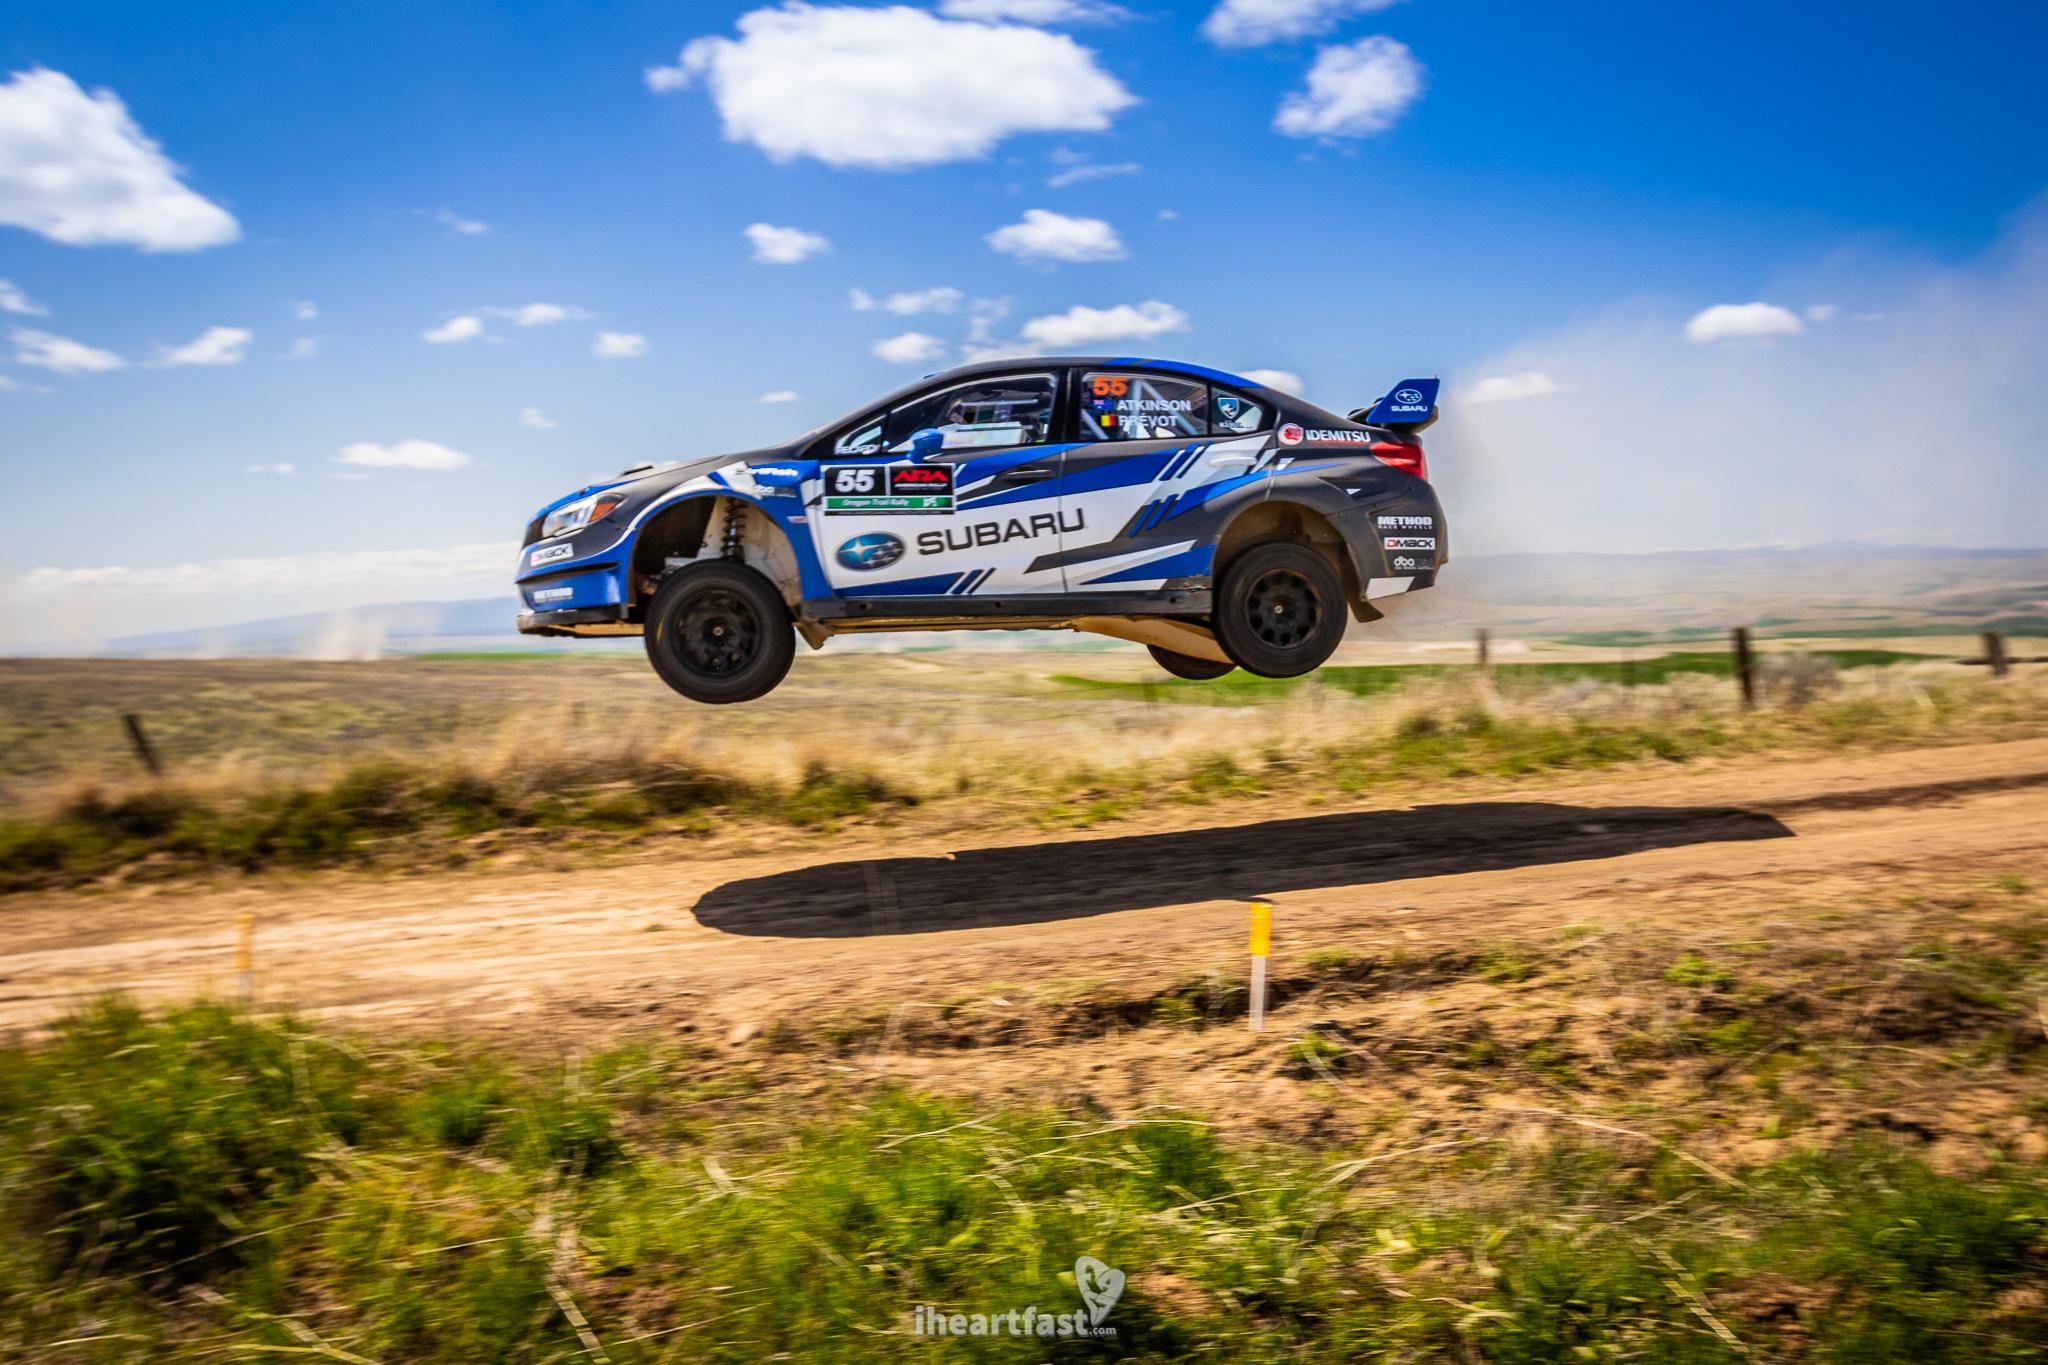 Chris Atko Atkinson soaring through the air